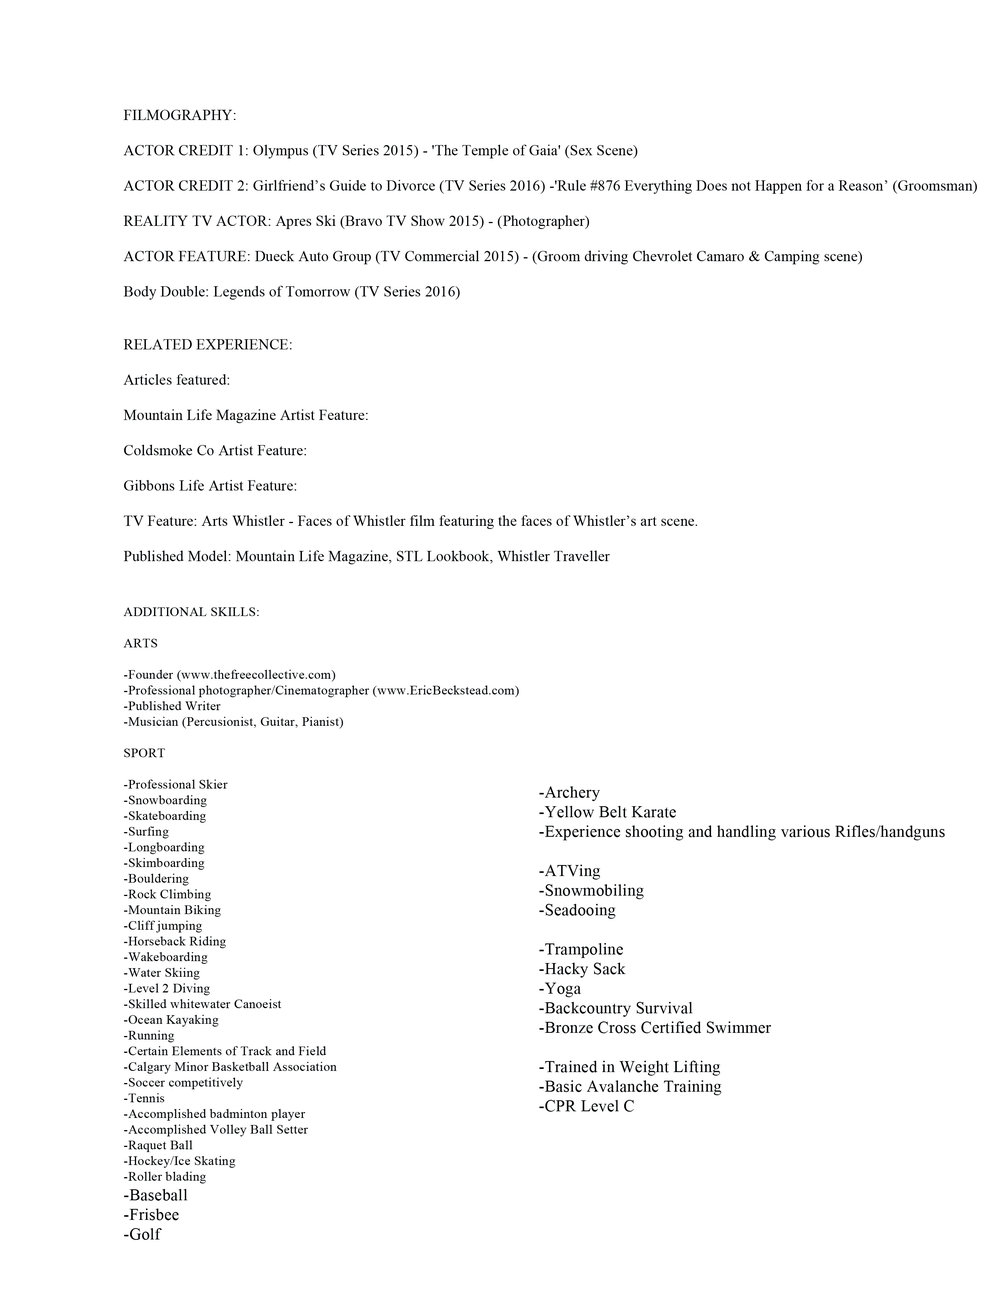 Acting Resume Page 2.jpg